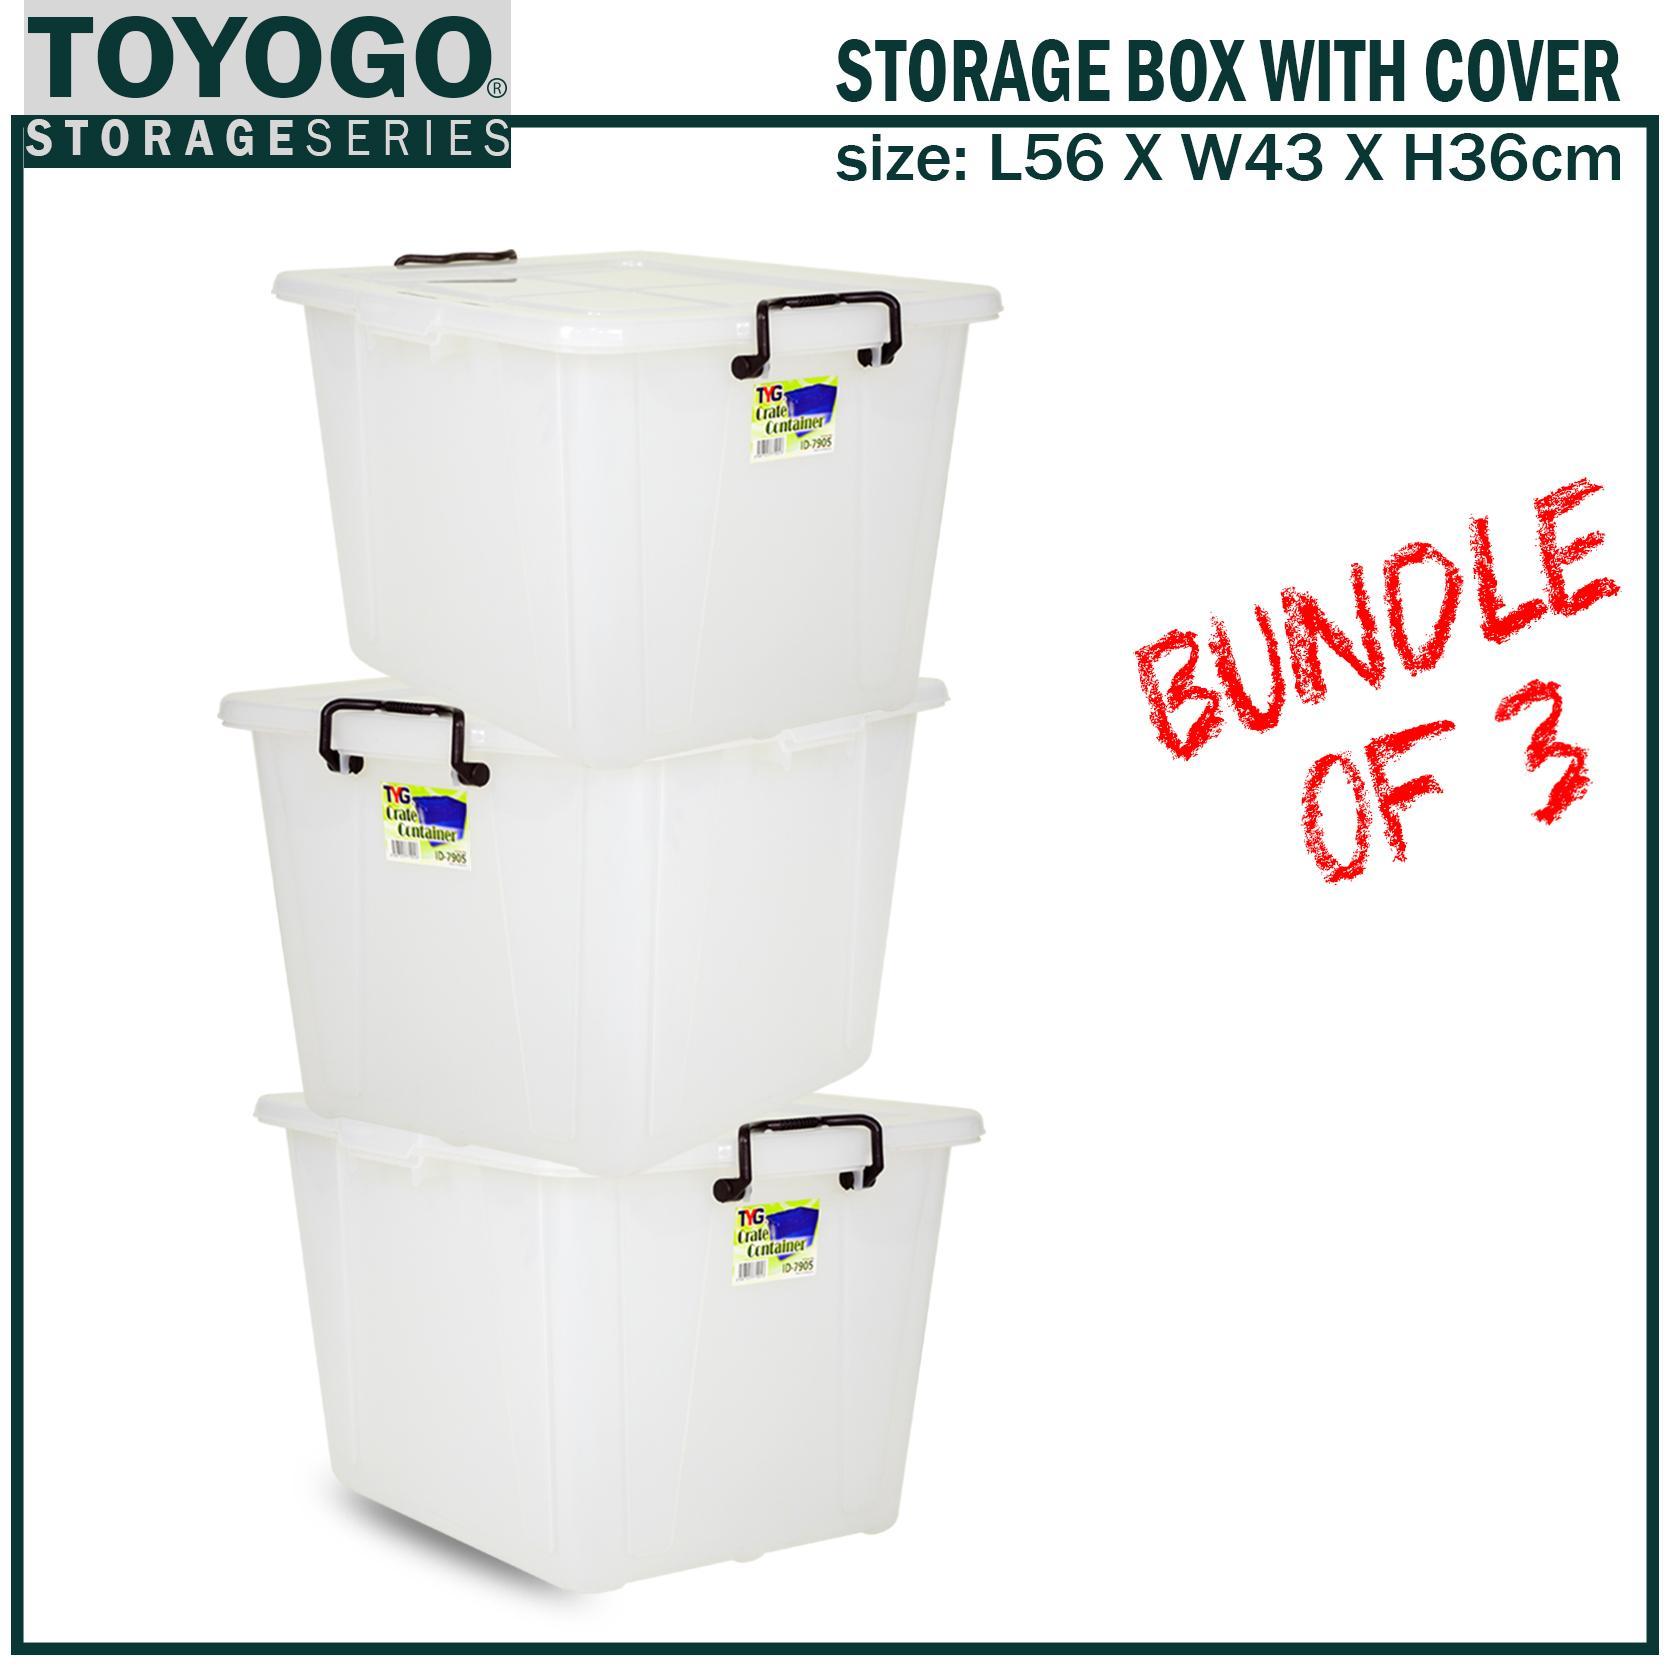 *BUNDLE OF 3 [7905]TOYOGO - PLASTIC STORAGE BOX(HOUSEHOLD STORAGE)